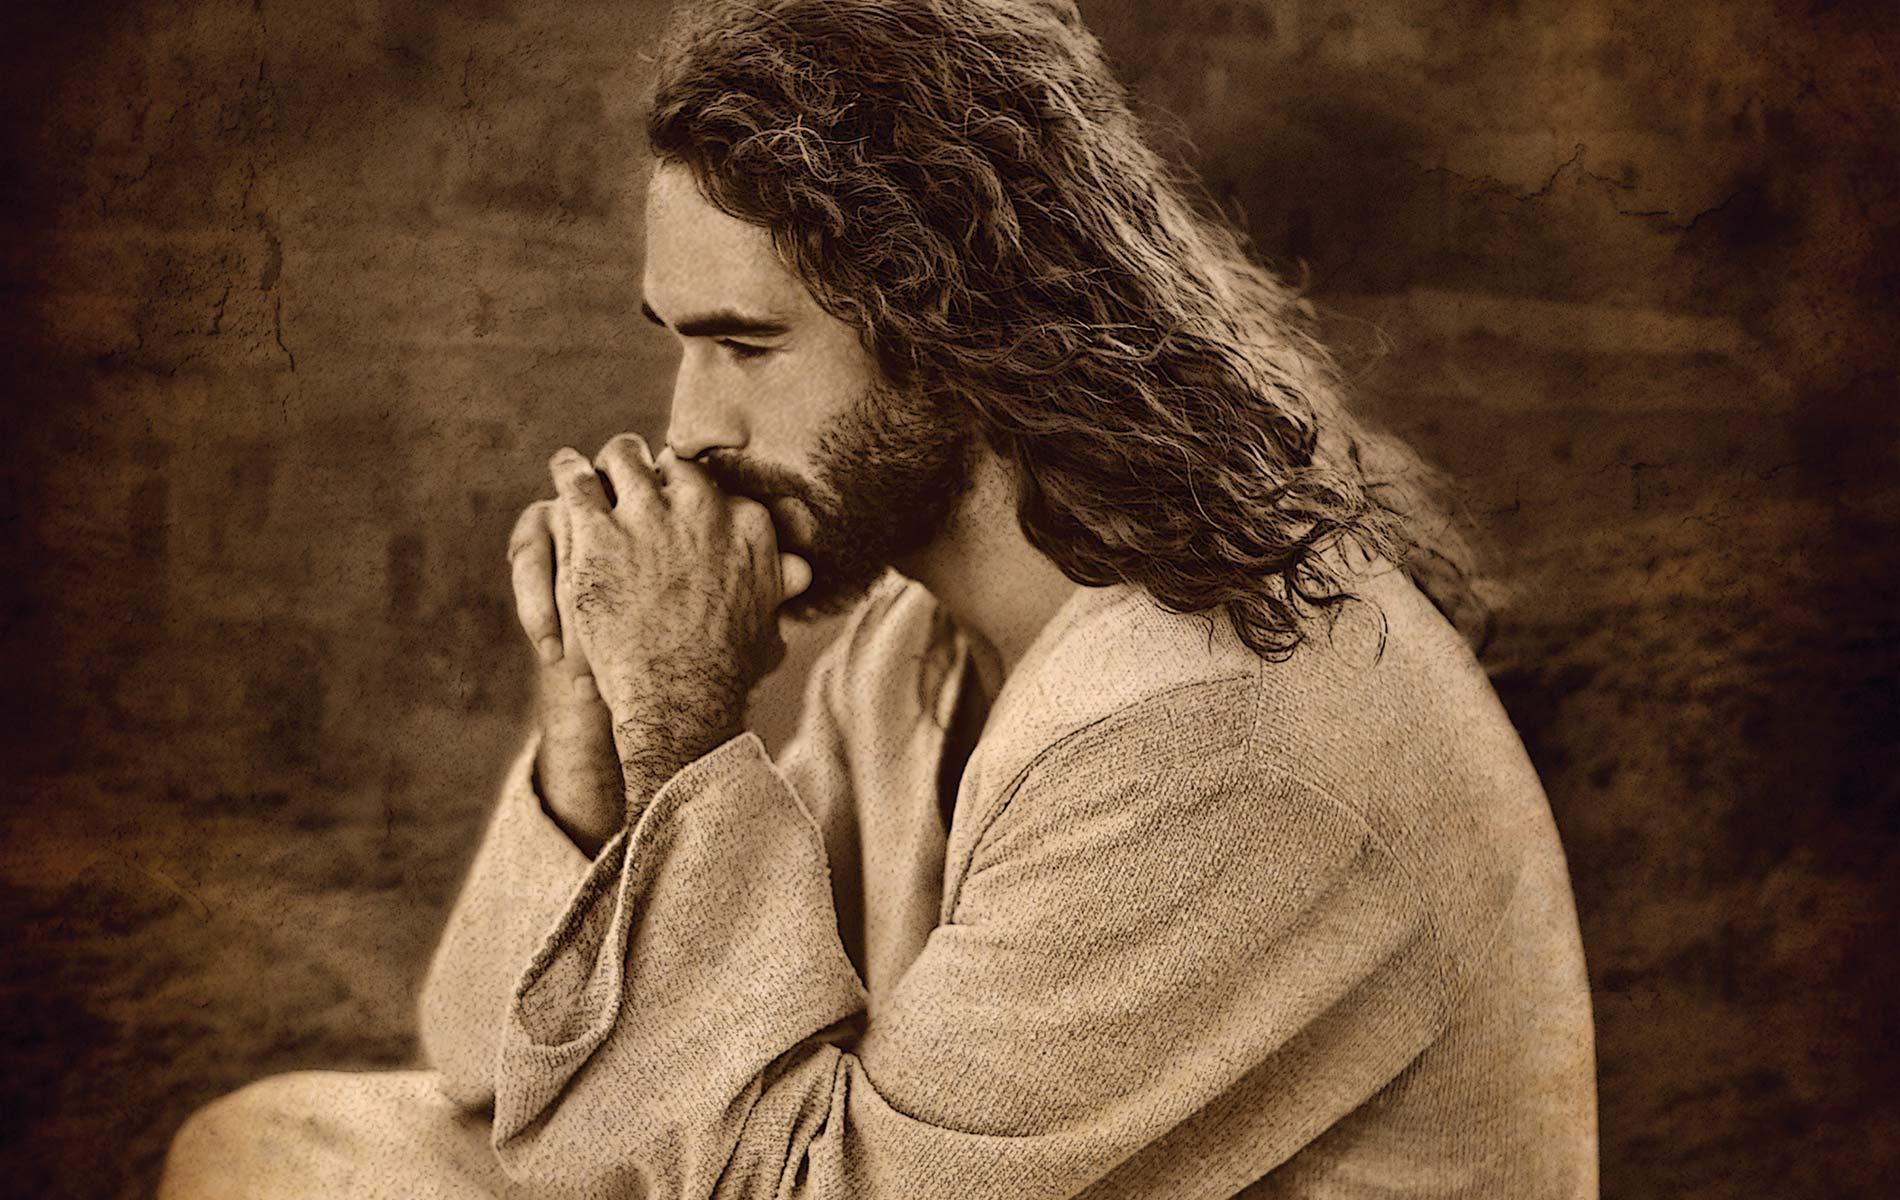 From GQ to Jesus - VIE Magazine